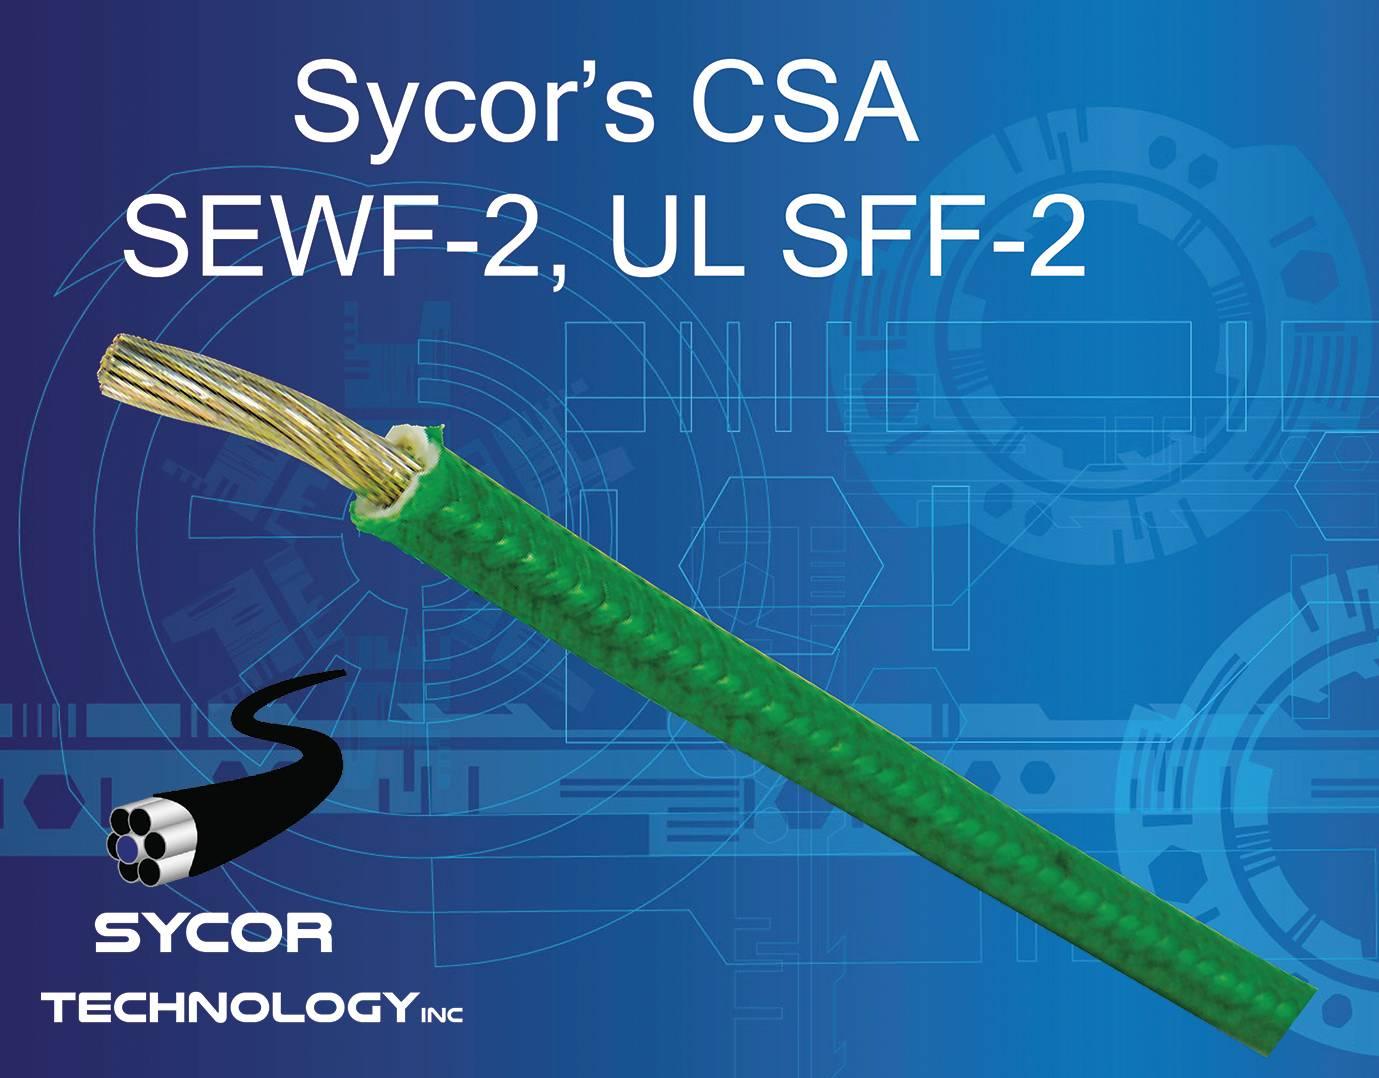 CSA SEWF-2, UL SFF-2 fiberglass stranded wire